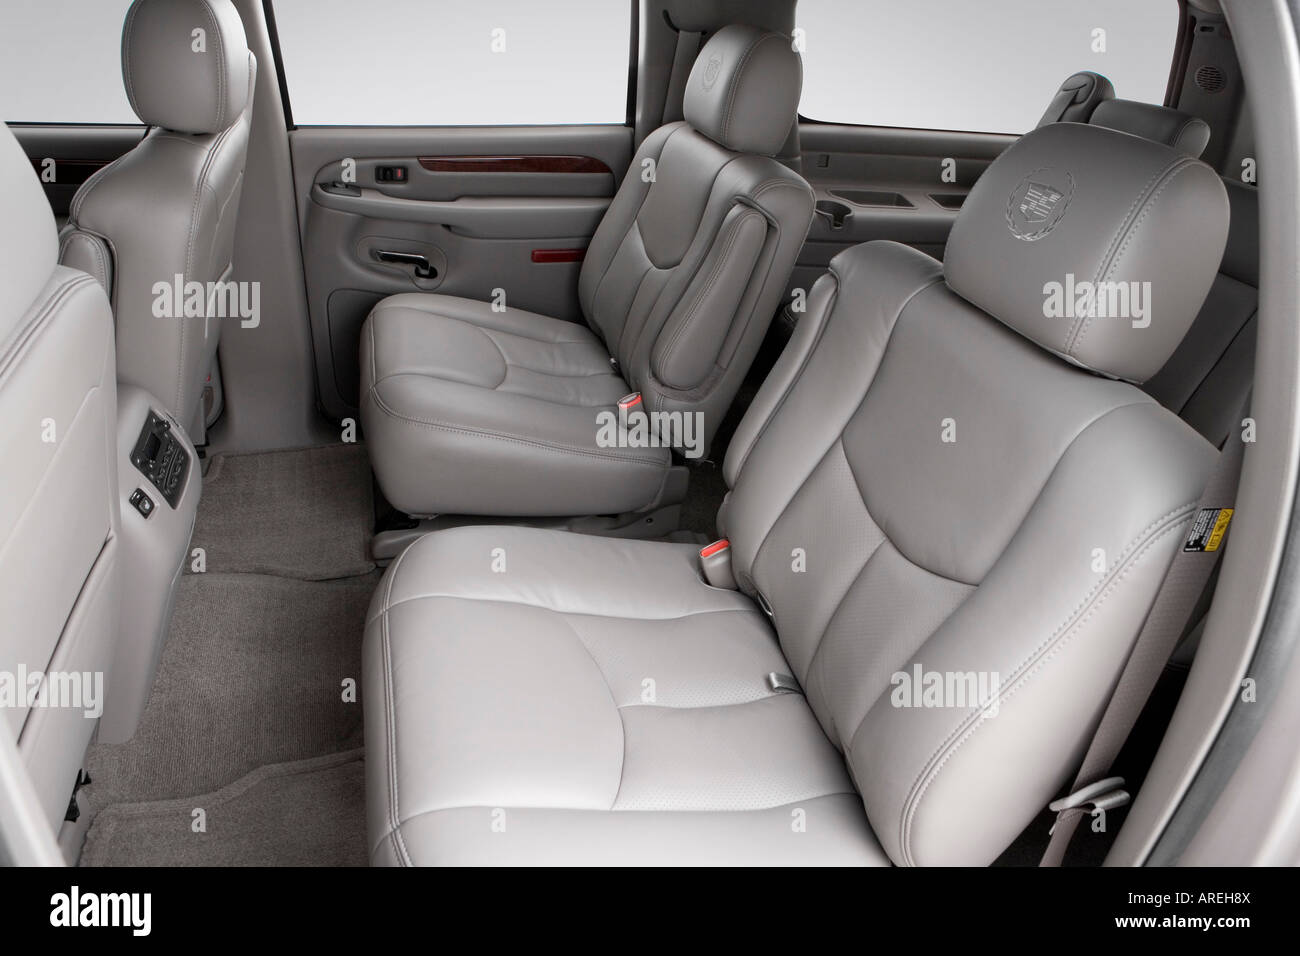 2006 cadillac escalade esv in silver rear seats stock photo